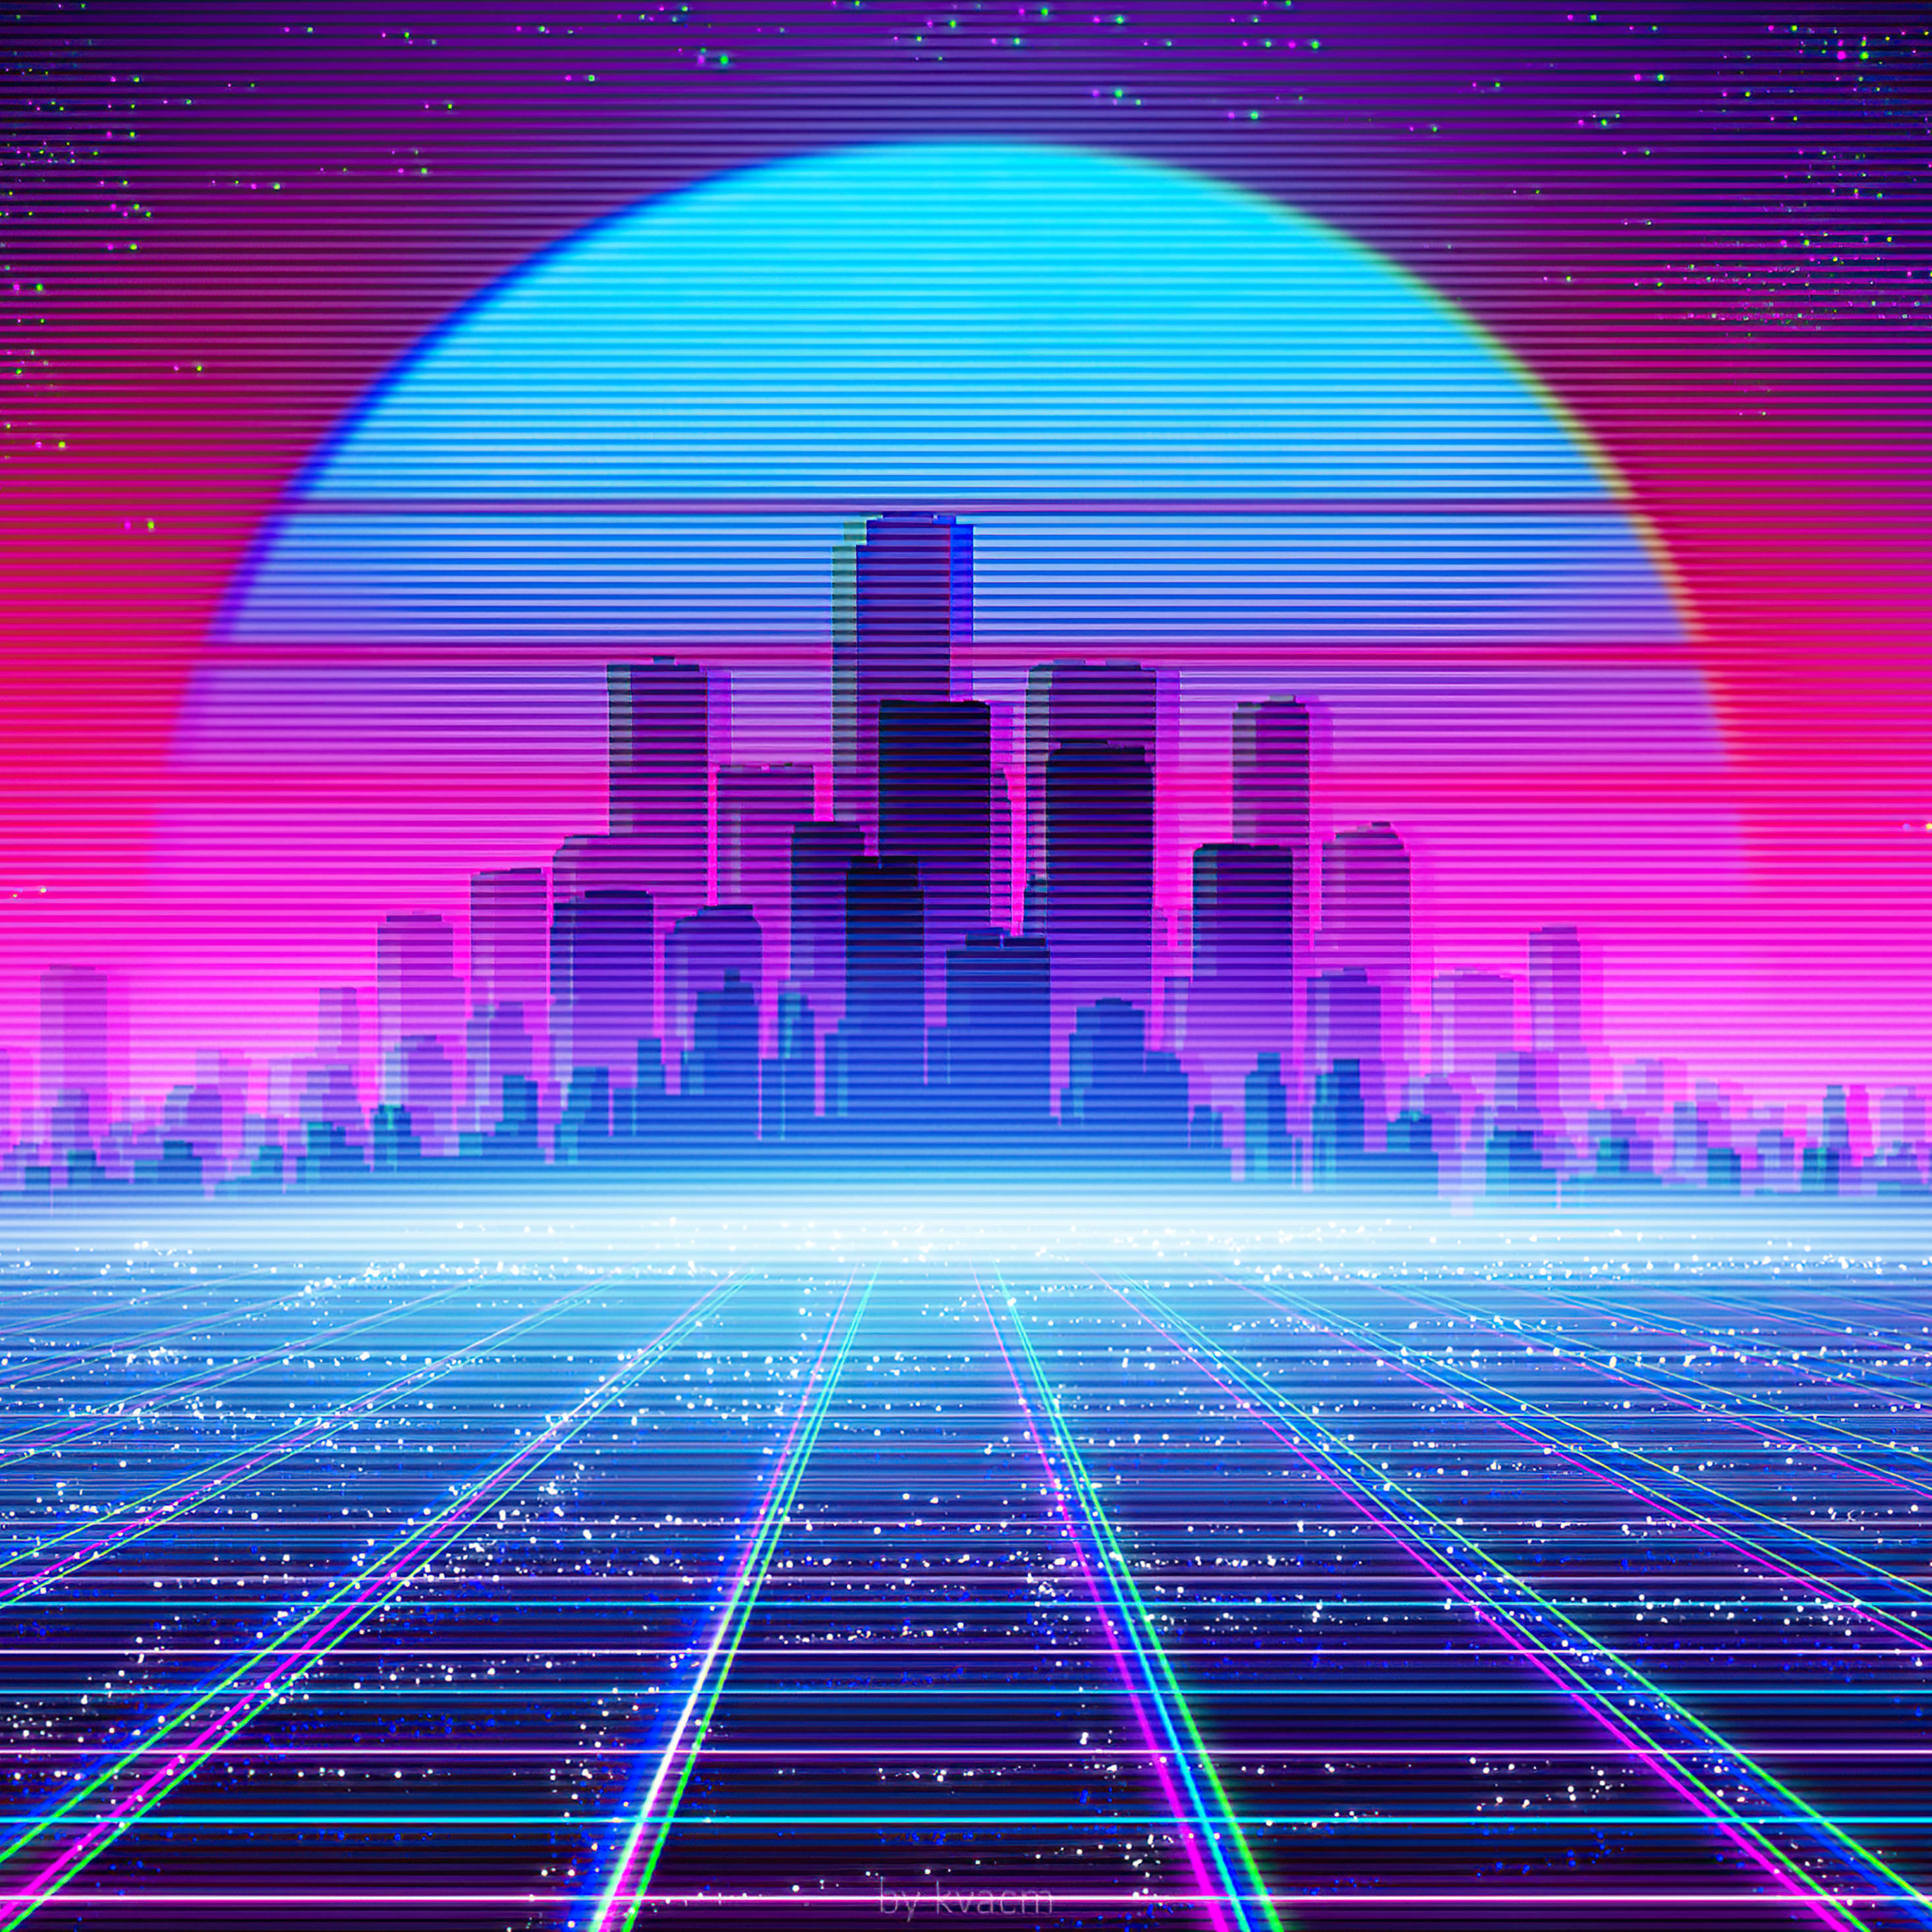 synthwave-cityscape-4k-6x.jpg